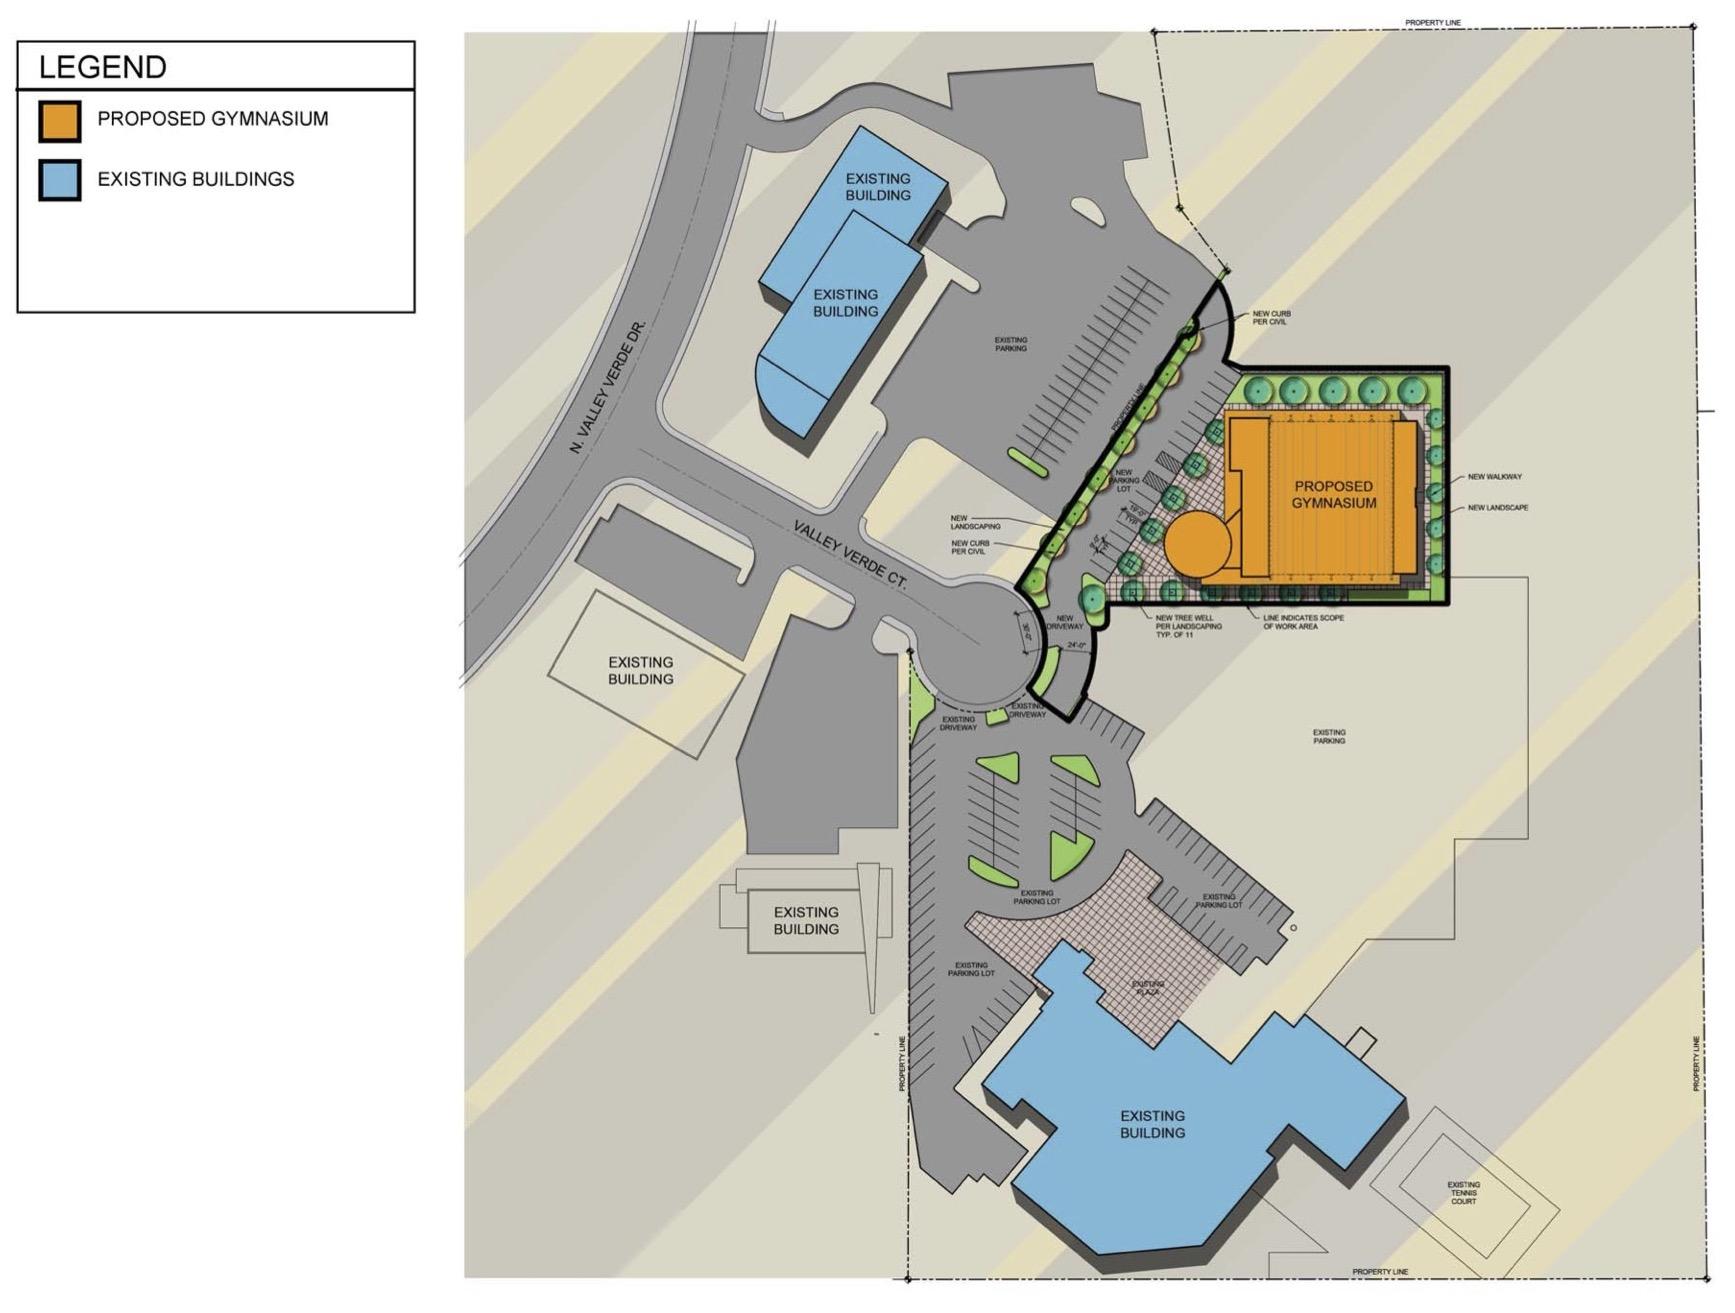 GVCC- Community Center-Gymnasium Schematic Design Drawings 10.9.19 1